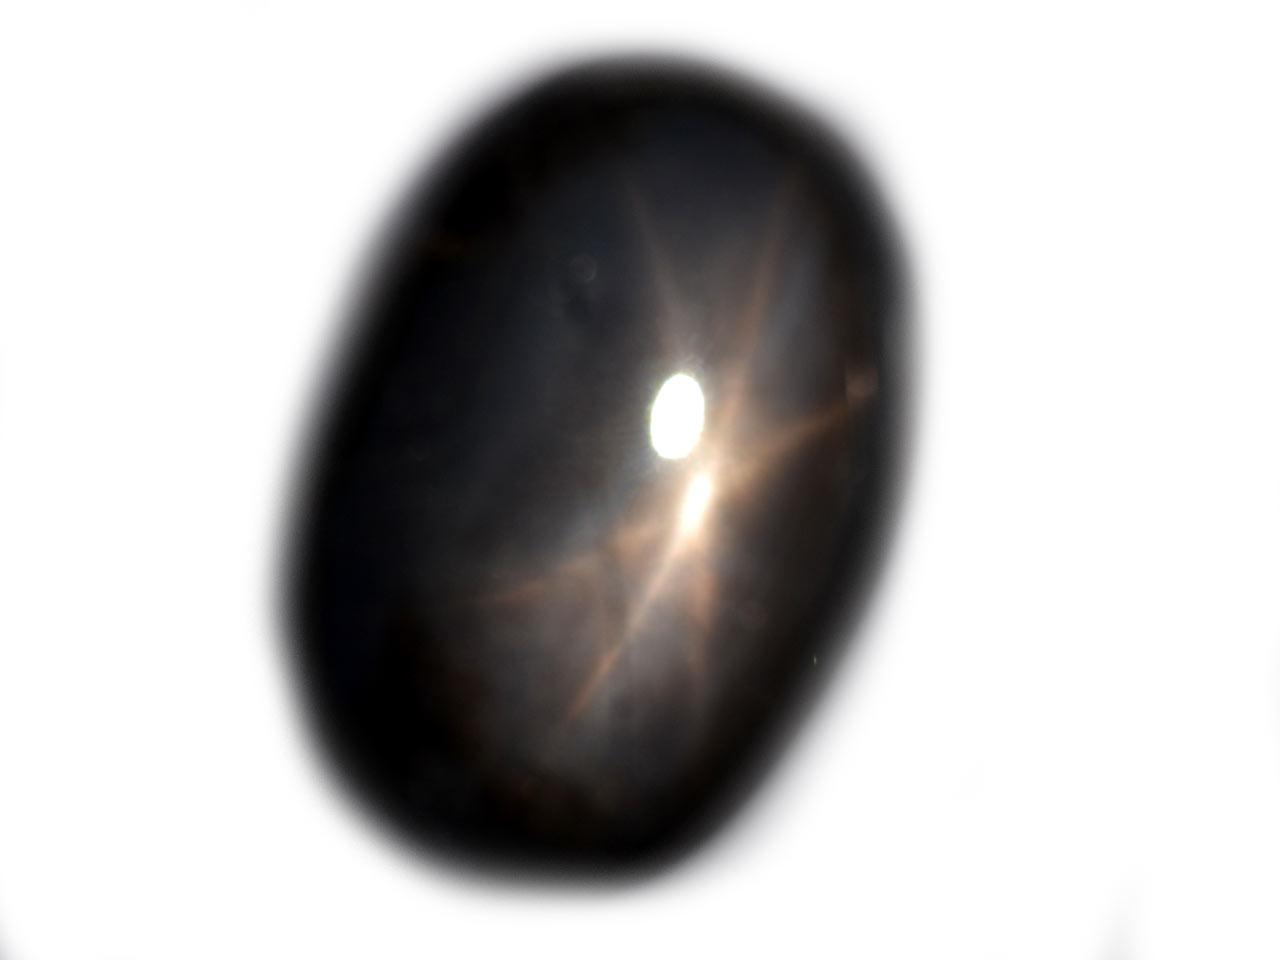 Thai Black Star Sapphire - 46.5 cts - 28.2x19.1x7.6mm